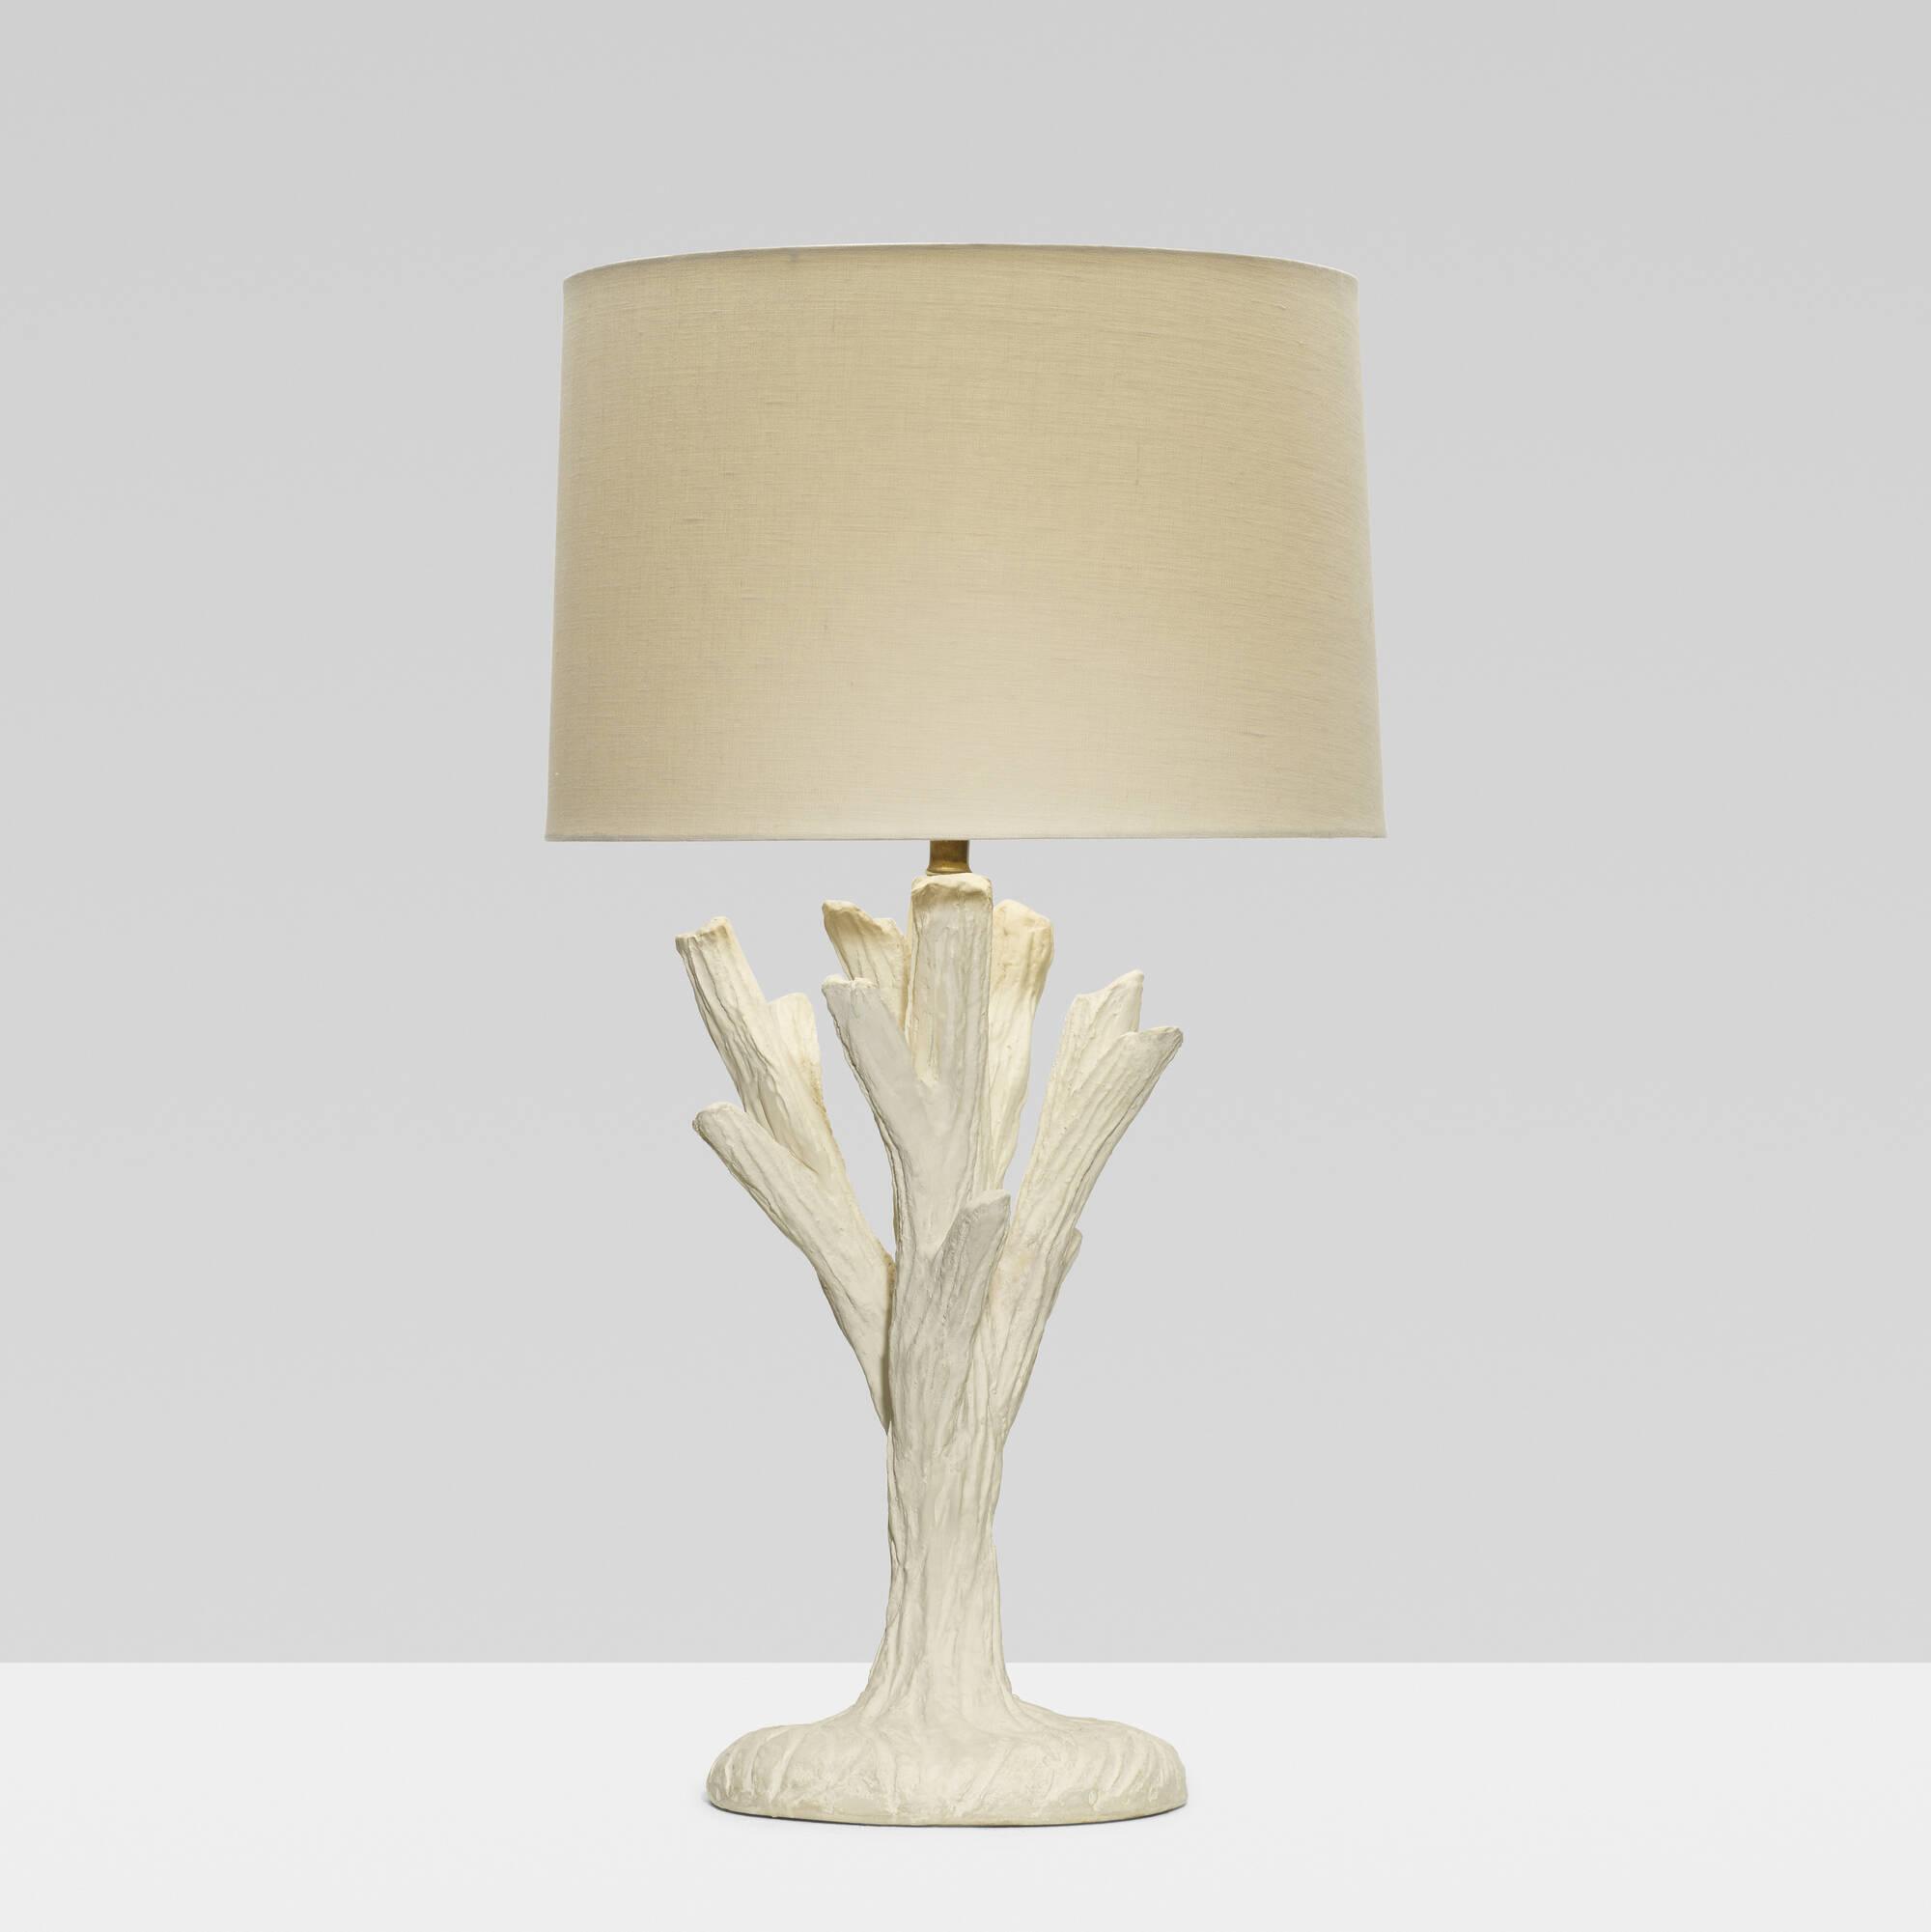 297: John Dickinson / branch table lamp (1 of 3)